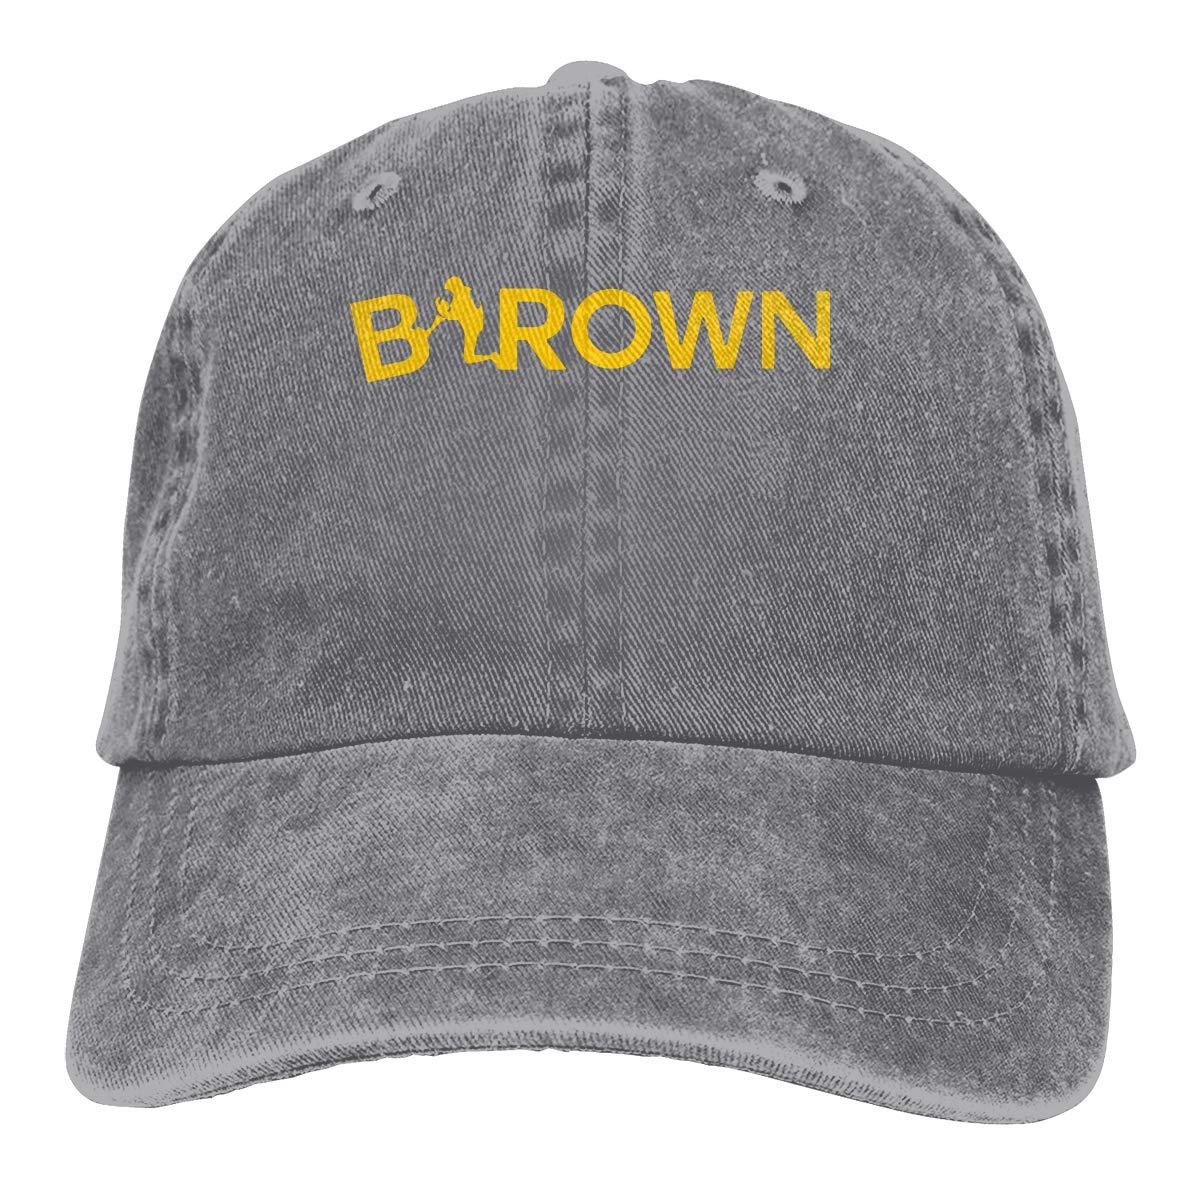 DeniCar Unisex Adjustable Baseball Caps Antonio-Brown-Name-Logo Cowboy Skull Cap